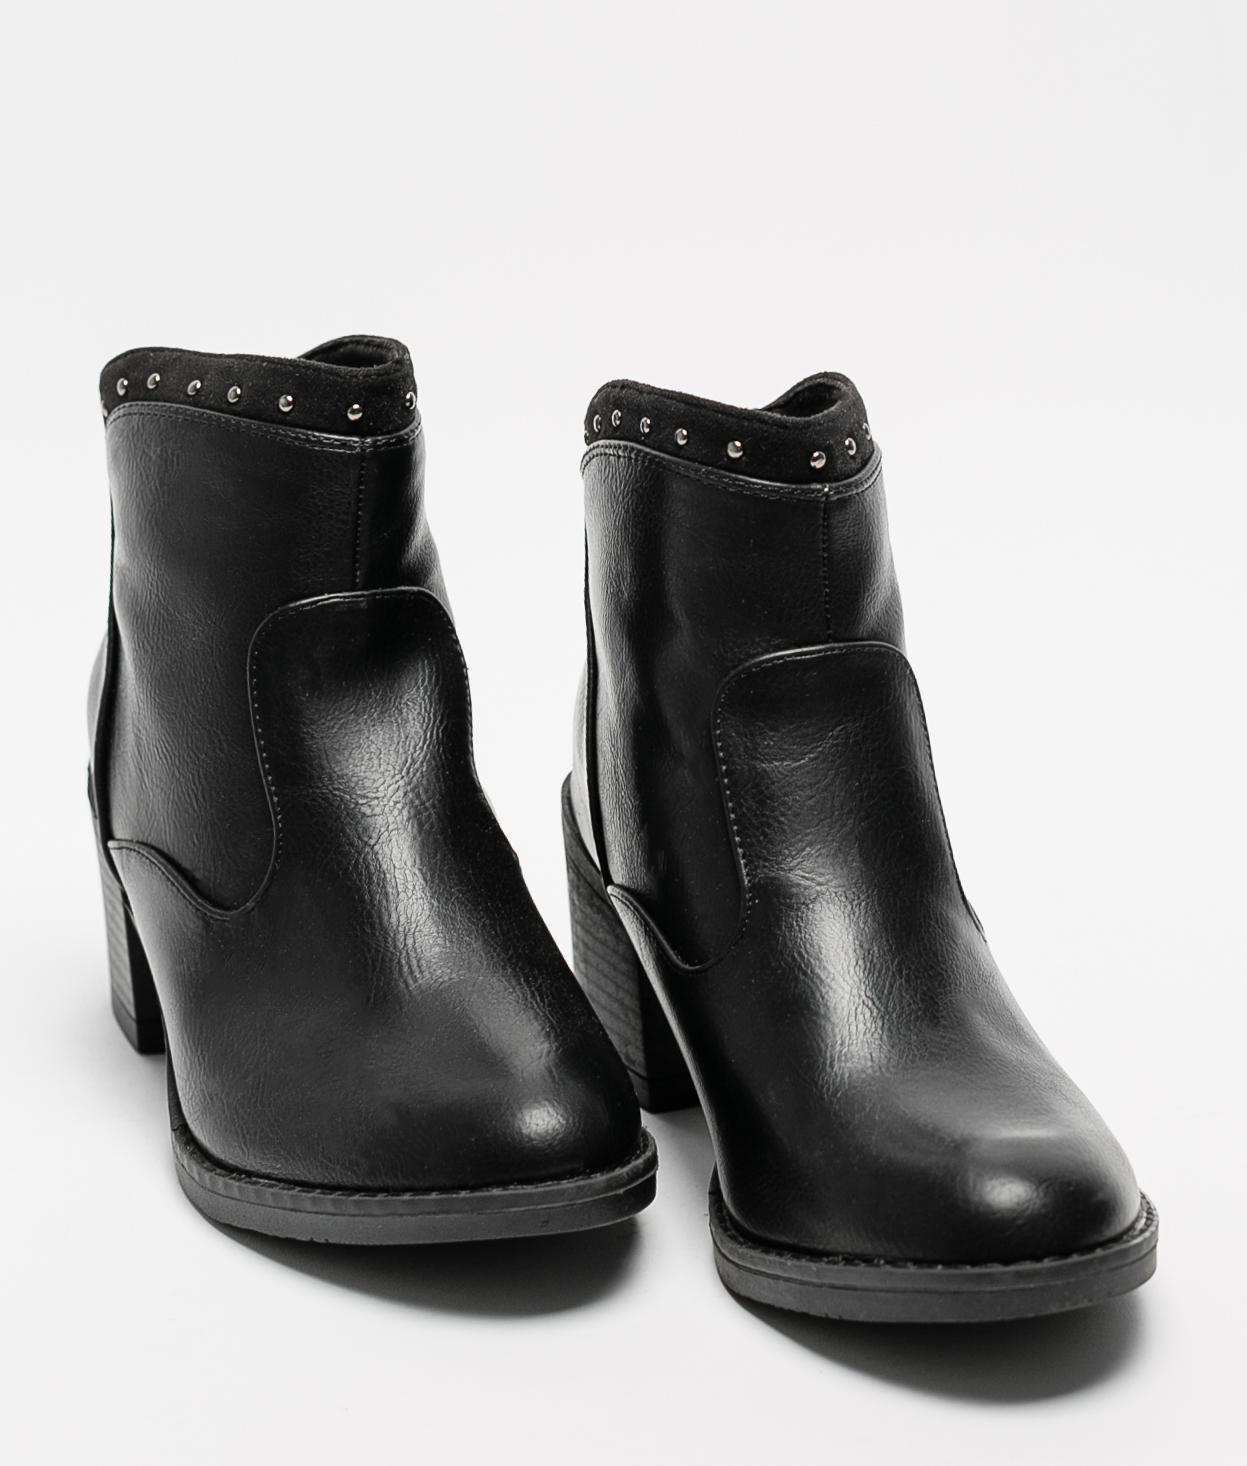 Low Boot Tiusa - Black